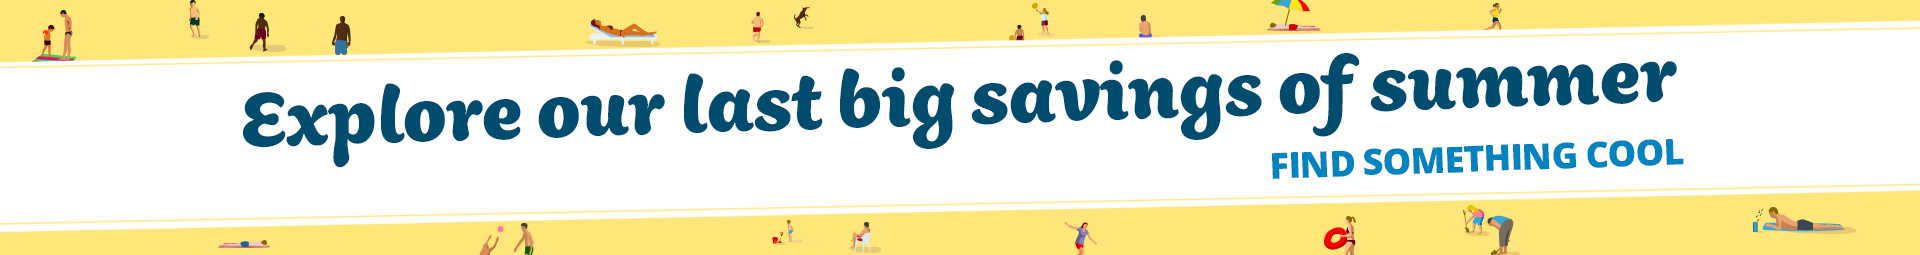 Explore our last big savings of summer